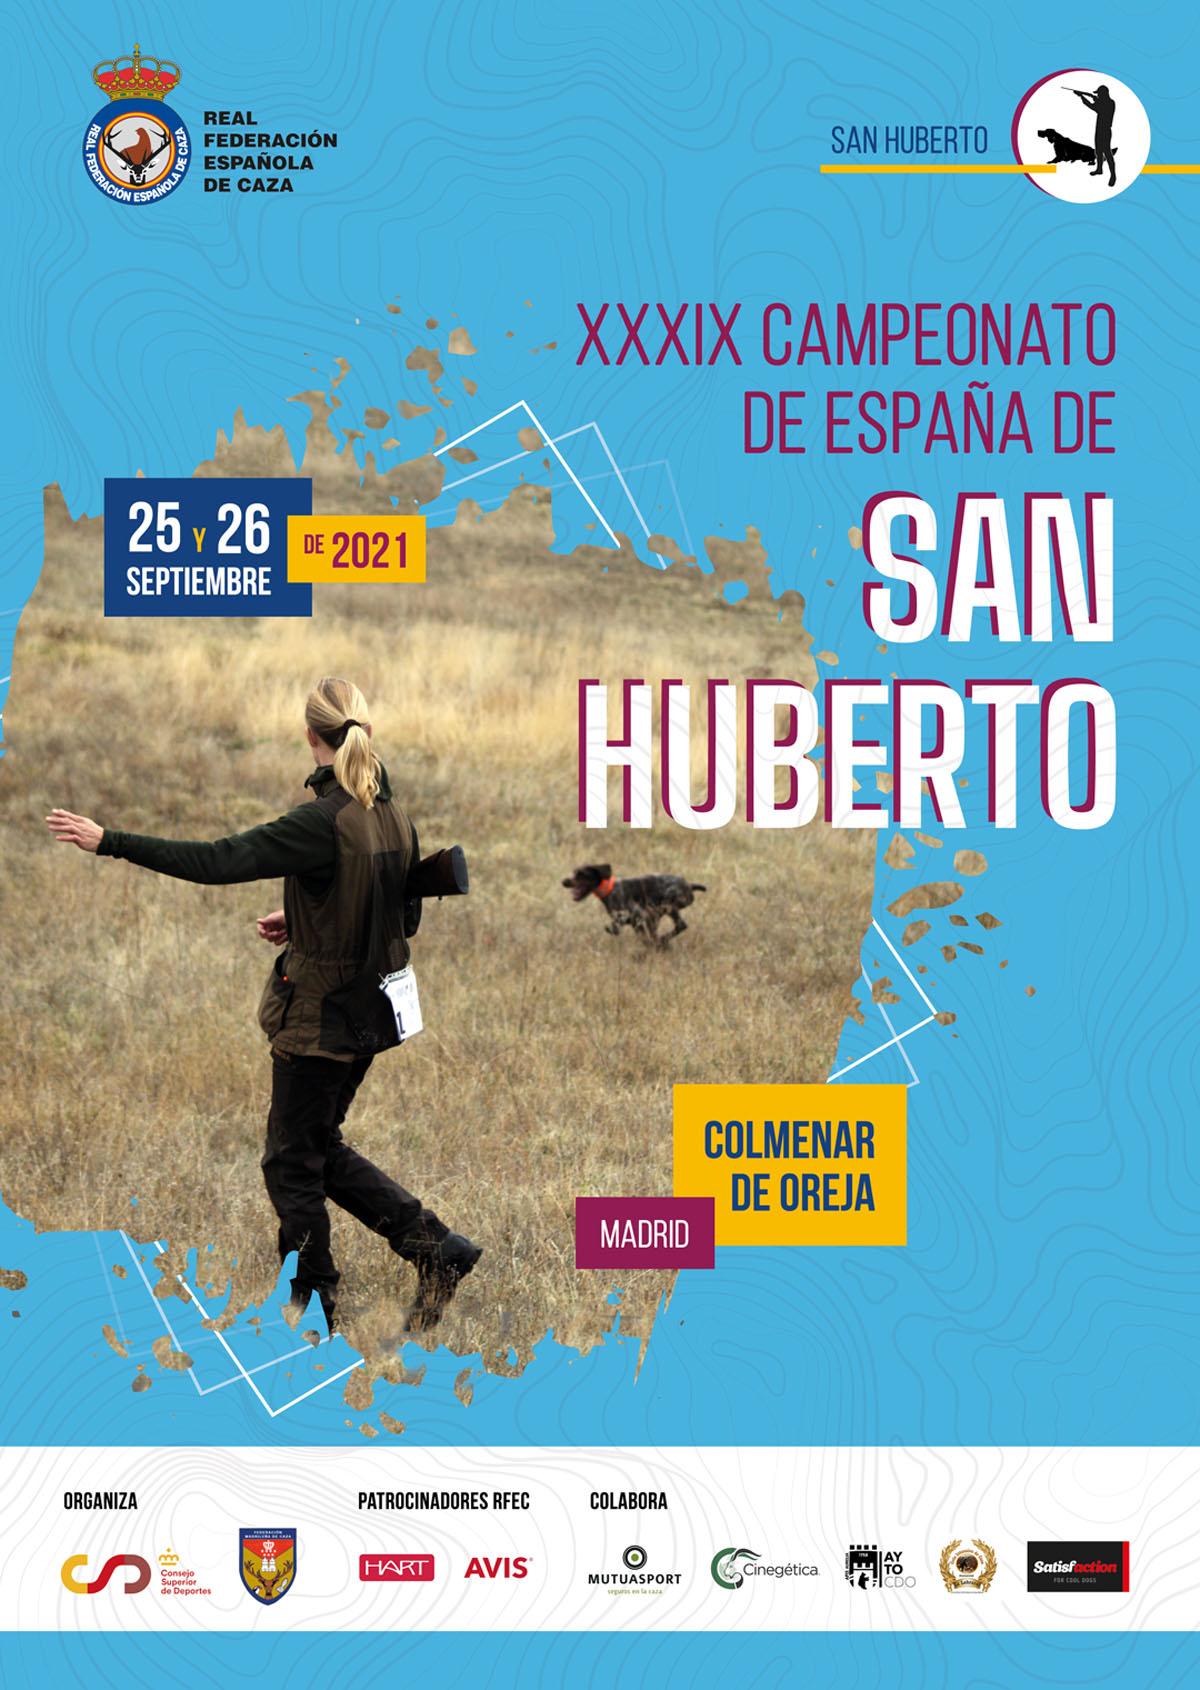 Campeonato de España de San Huberto 2021